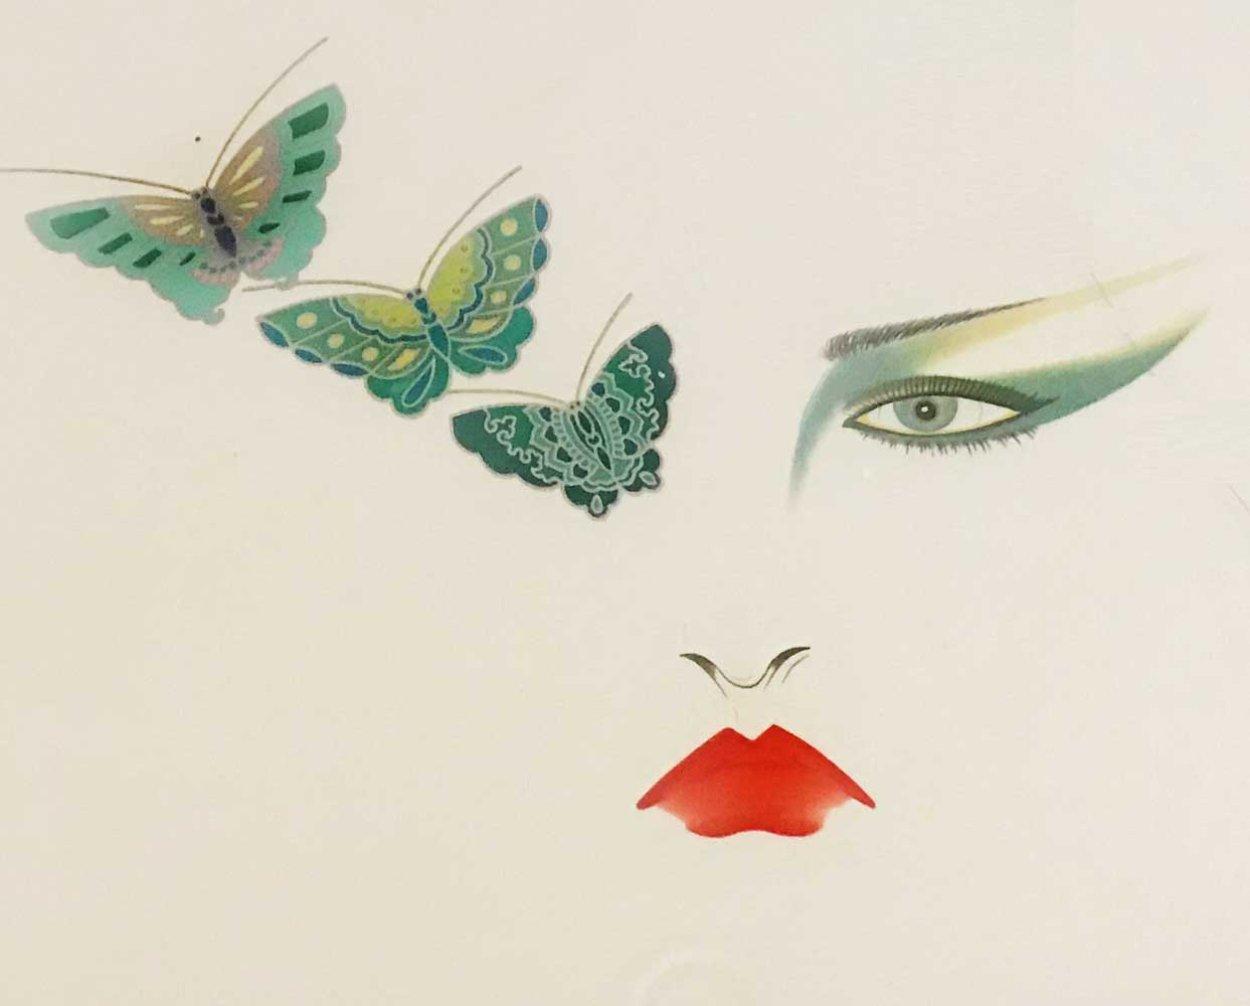 Eyes of Otsuka - Butterflies Limited Edition Print by Hisashi Otsuka